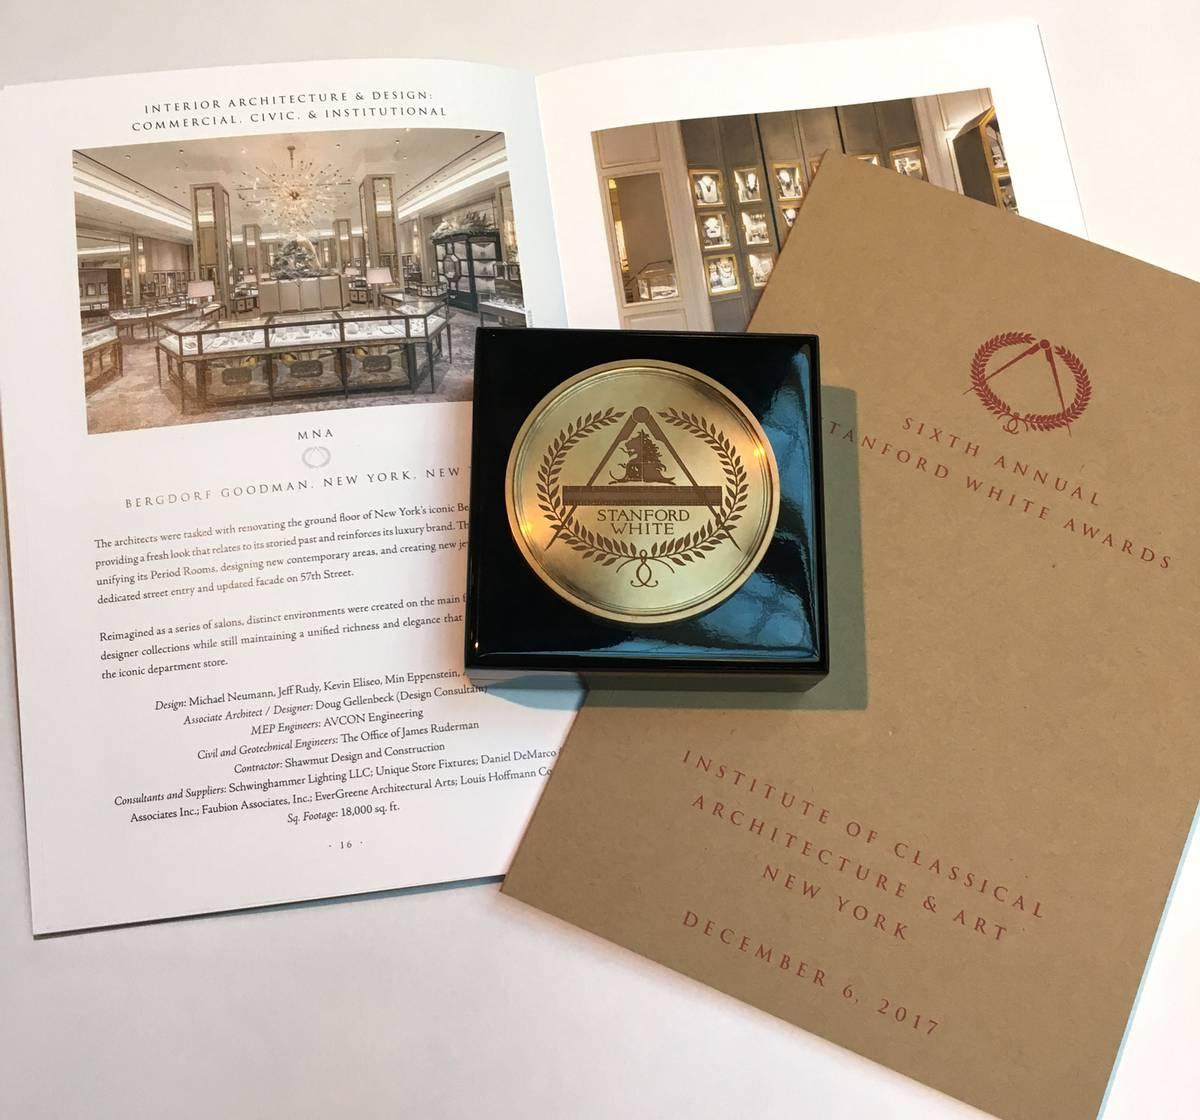 Stanford White Award Winner - Bergdorf Goodman, NYC - Architect: Neumann & Rudy